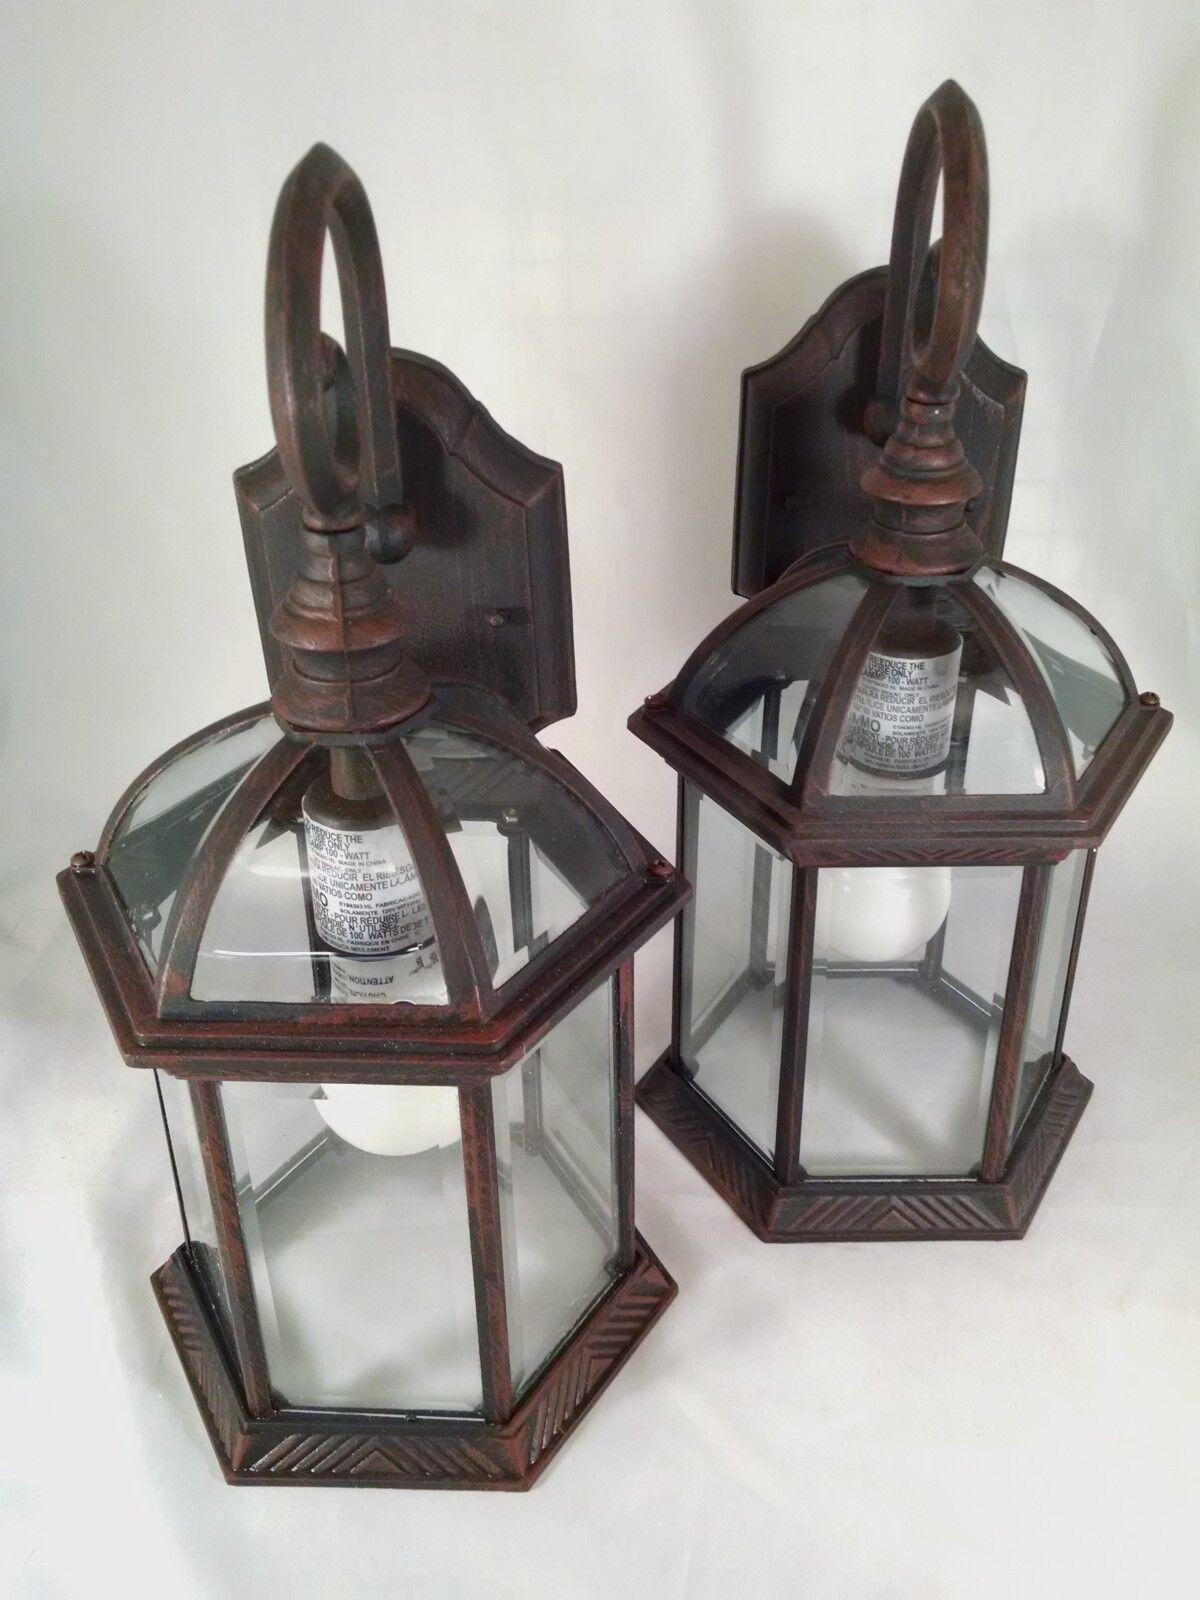 2 PACK Wall Lanterns Cast Aluminum Rust Finish Clear Glass EASILY CHANGE BULB